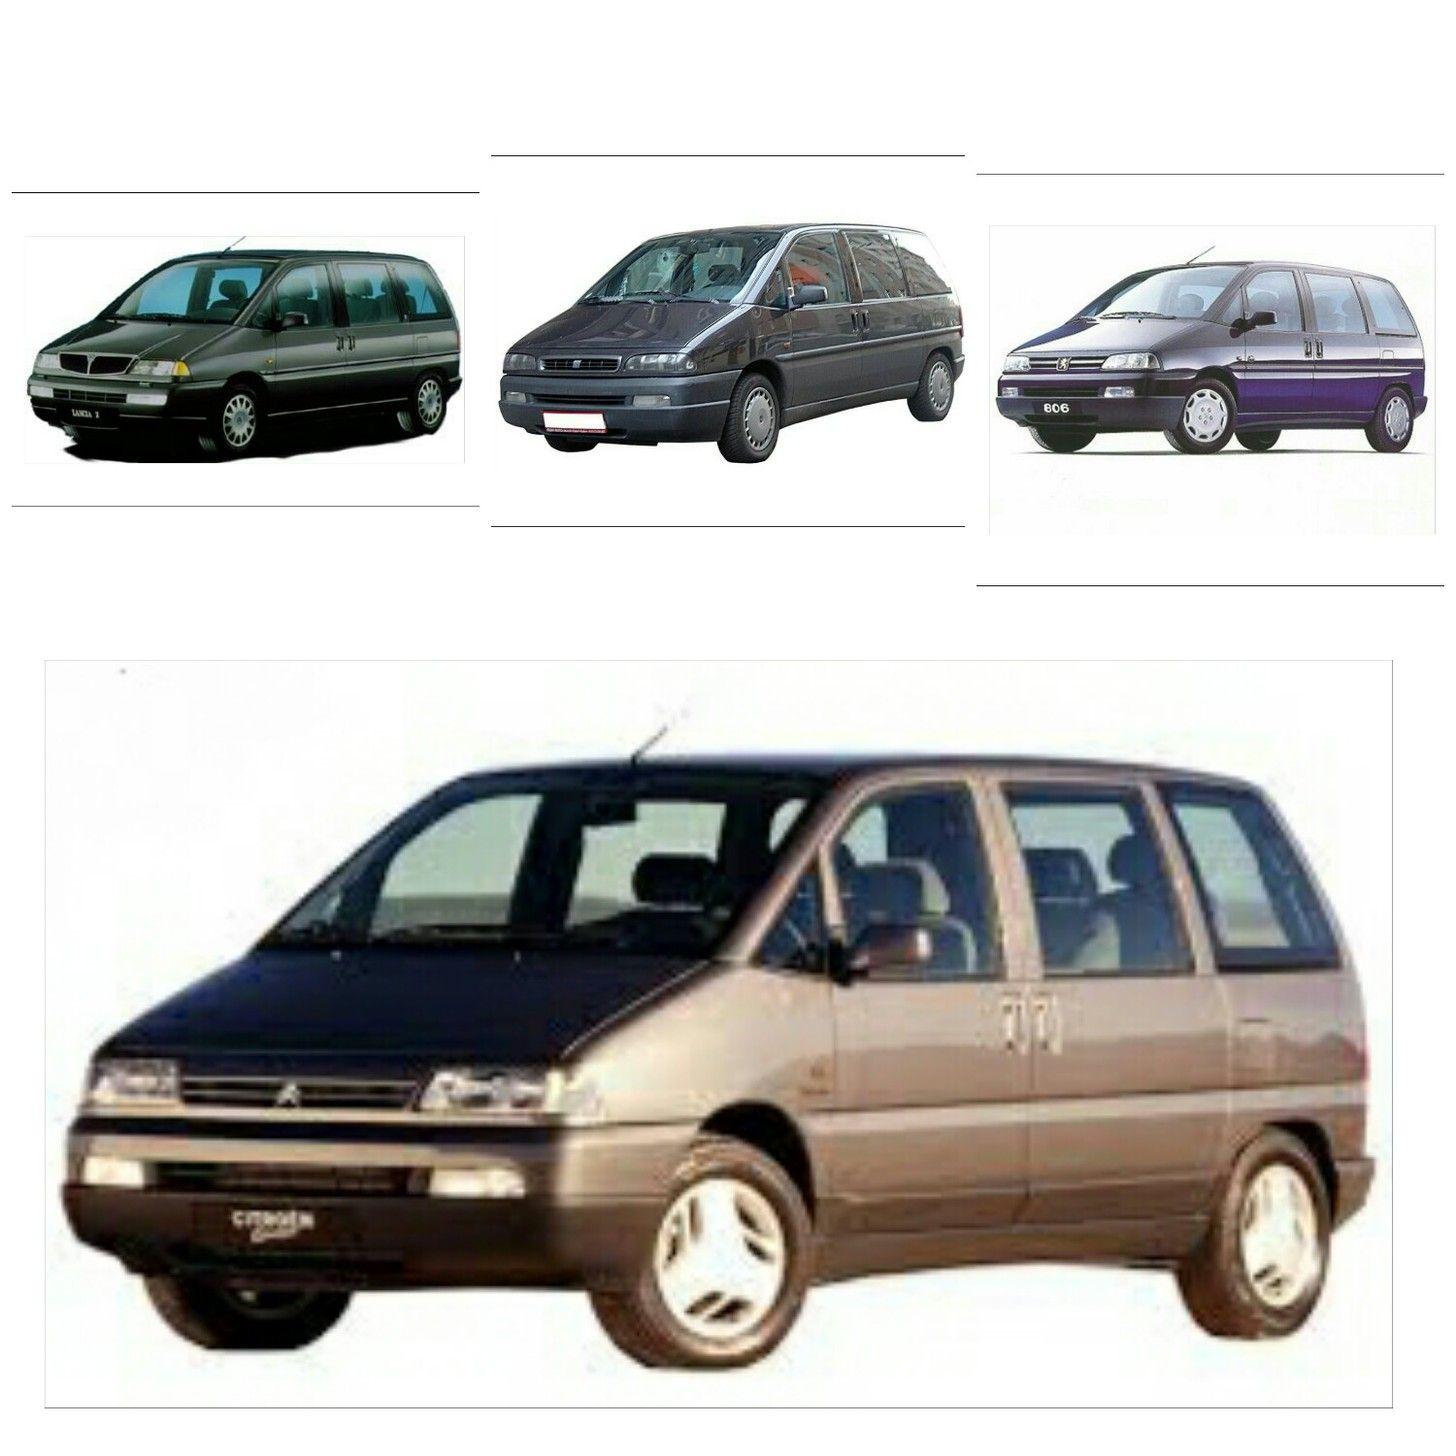 Lancia zeta top left fiat ulysse top centre peugeot 806